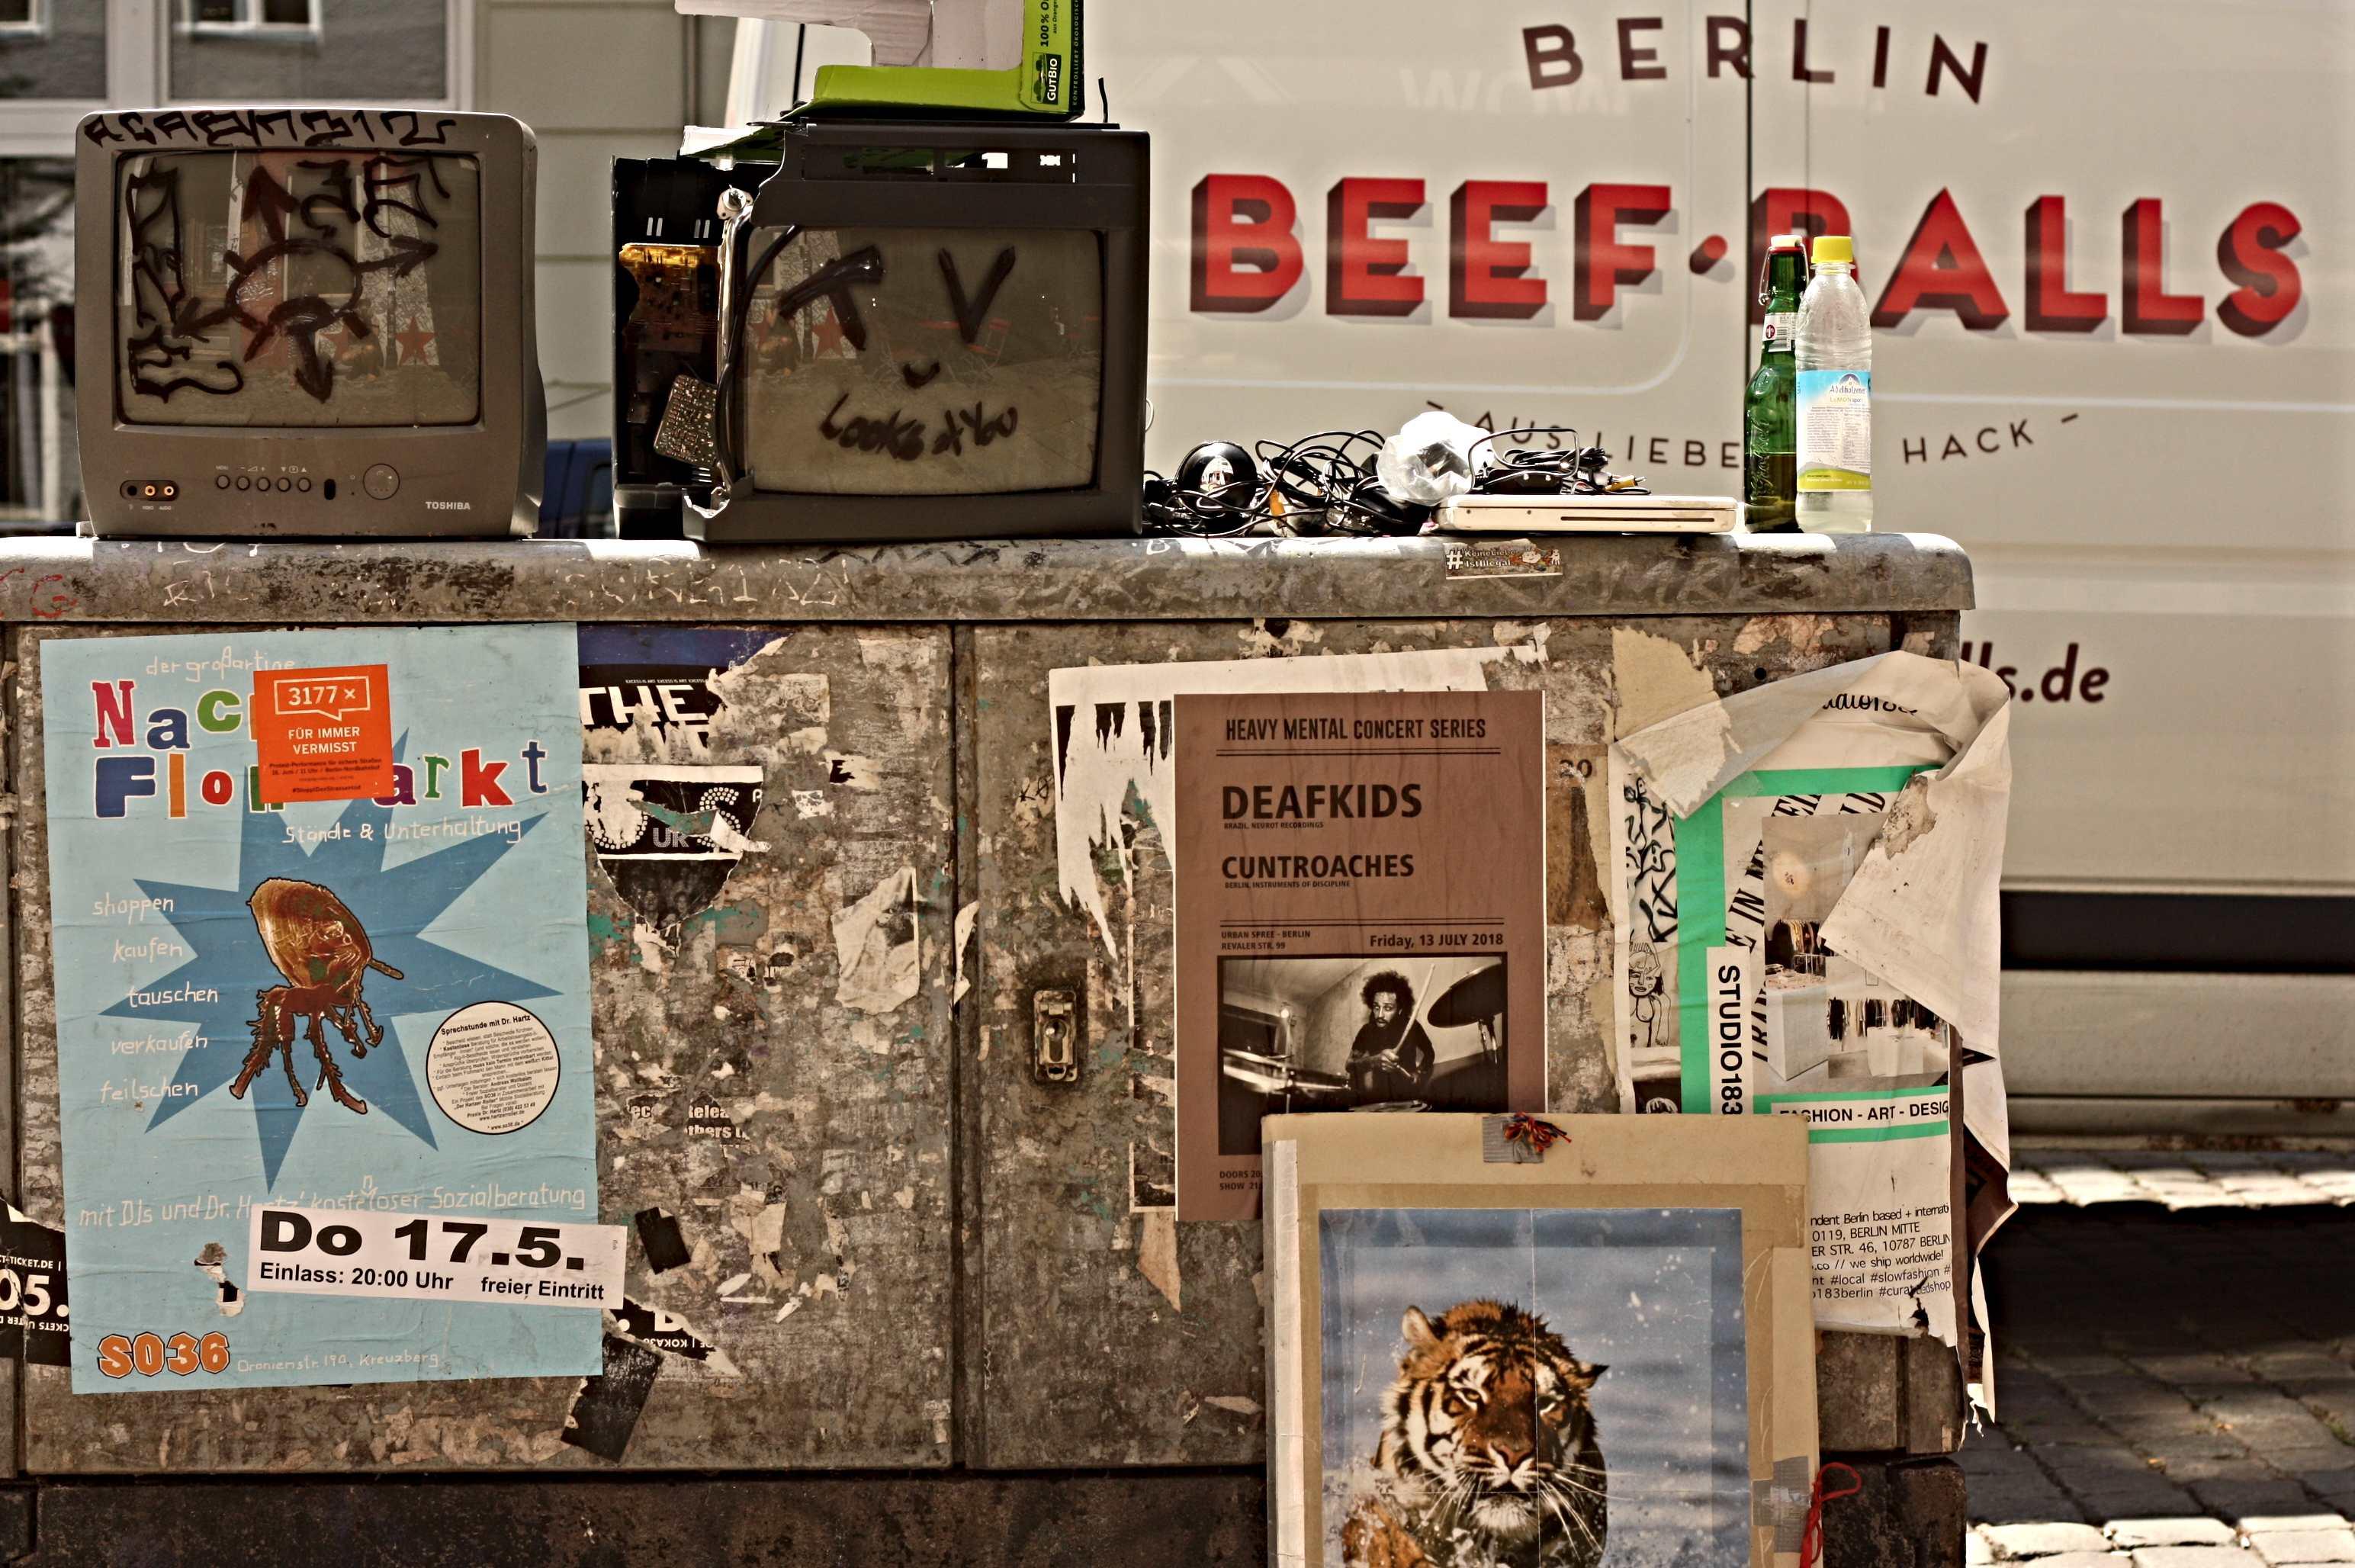 ברלין 13